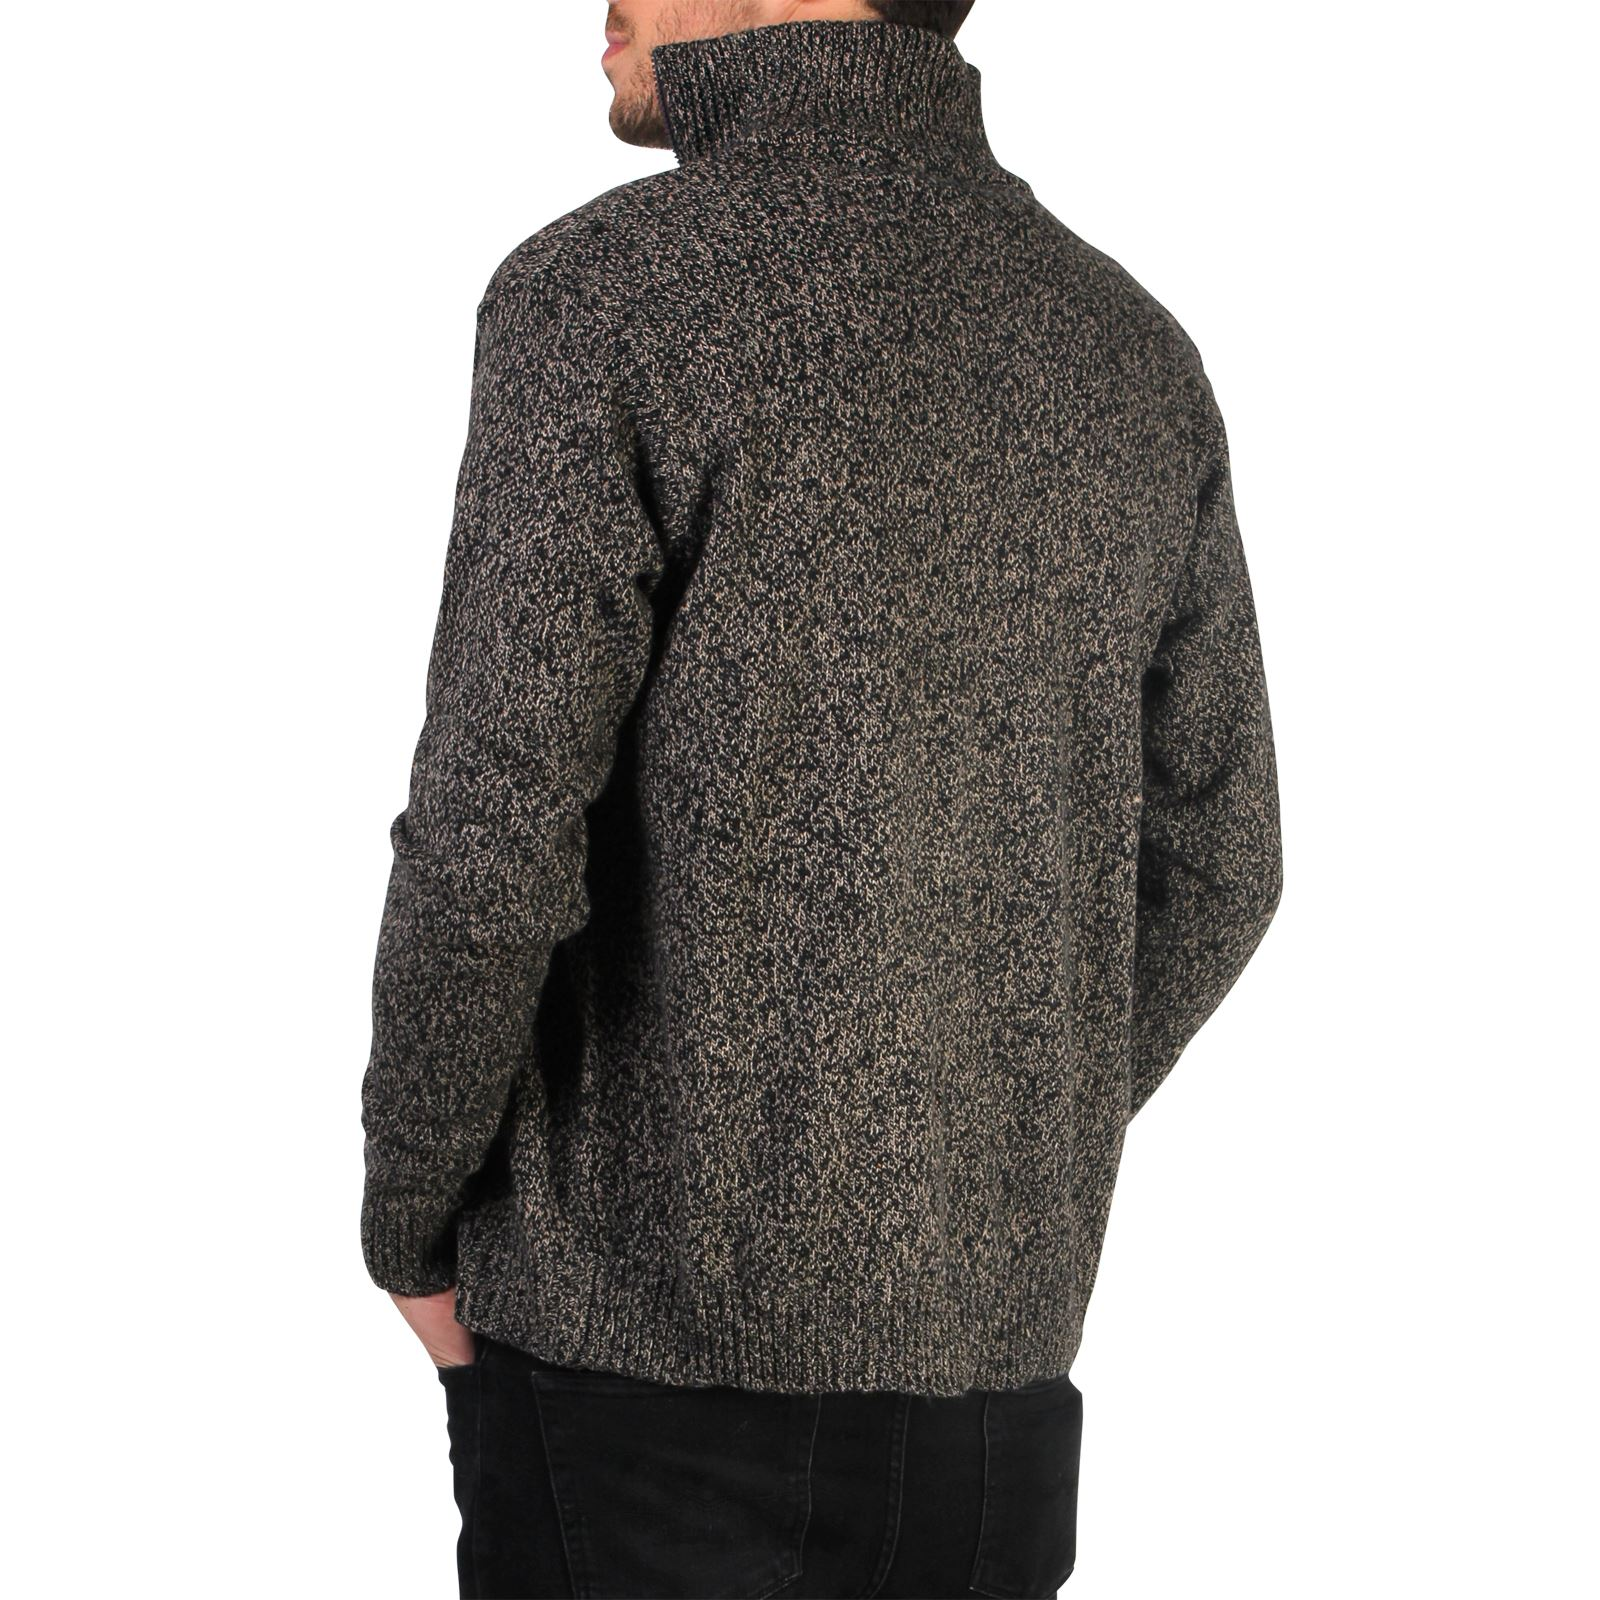 Mens-Wool-Jumper-Winter-Sweater-Zip-Up-Funnel-Neck-Soft-Knit-Cardigan-Top thumbnail 7